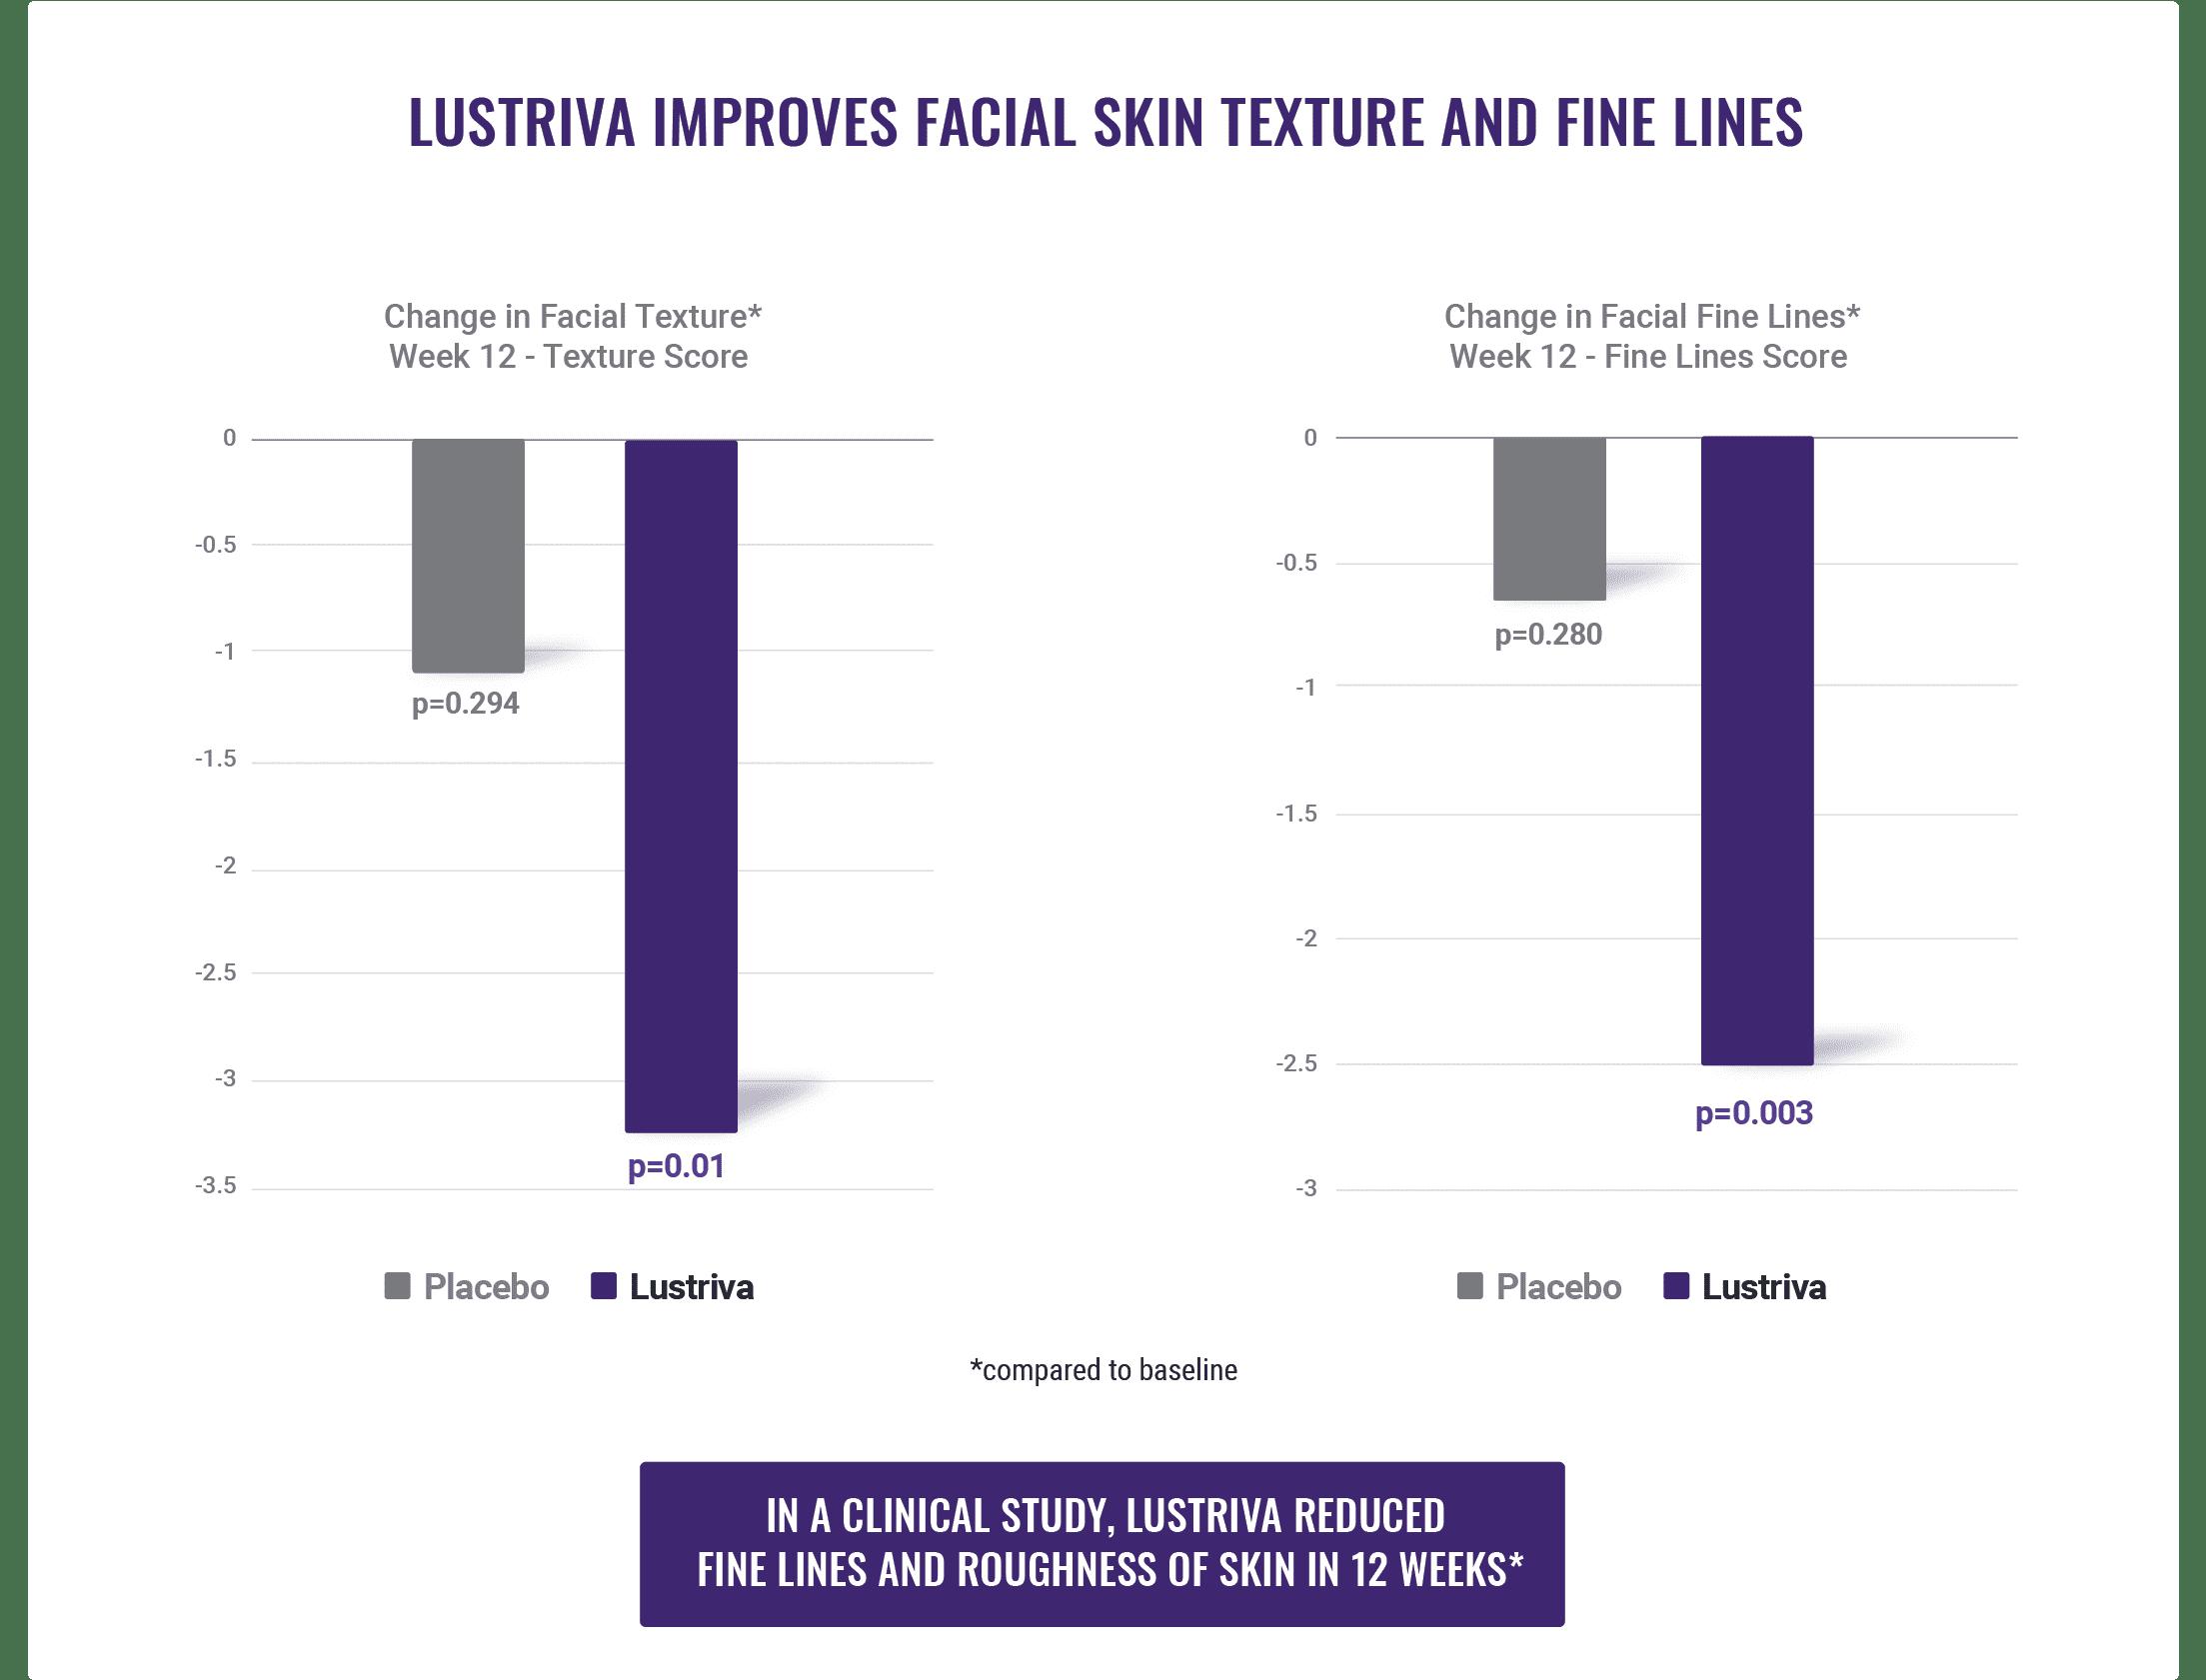 Lustriva ImprovesFacialTexture 2 Nutrition21